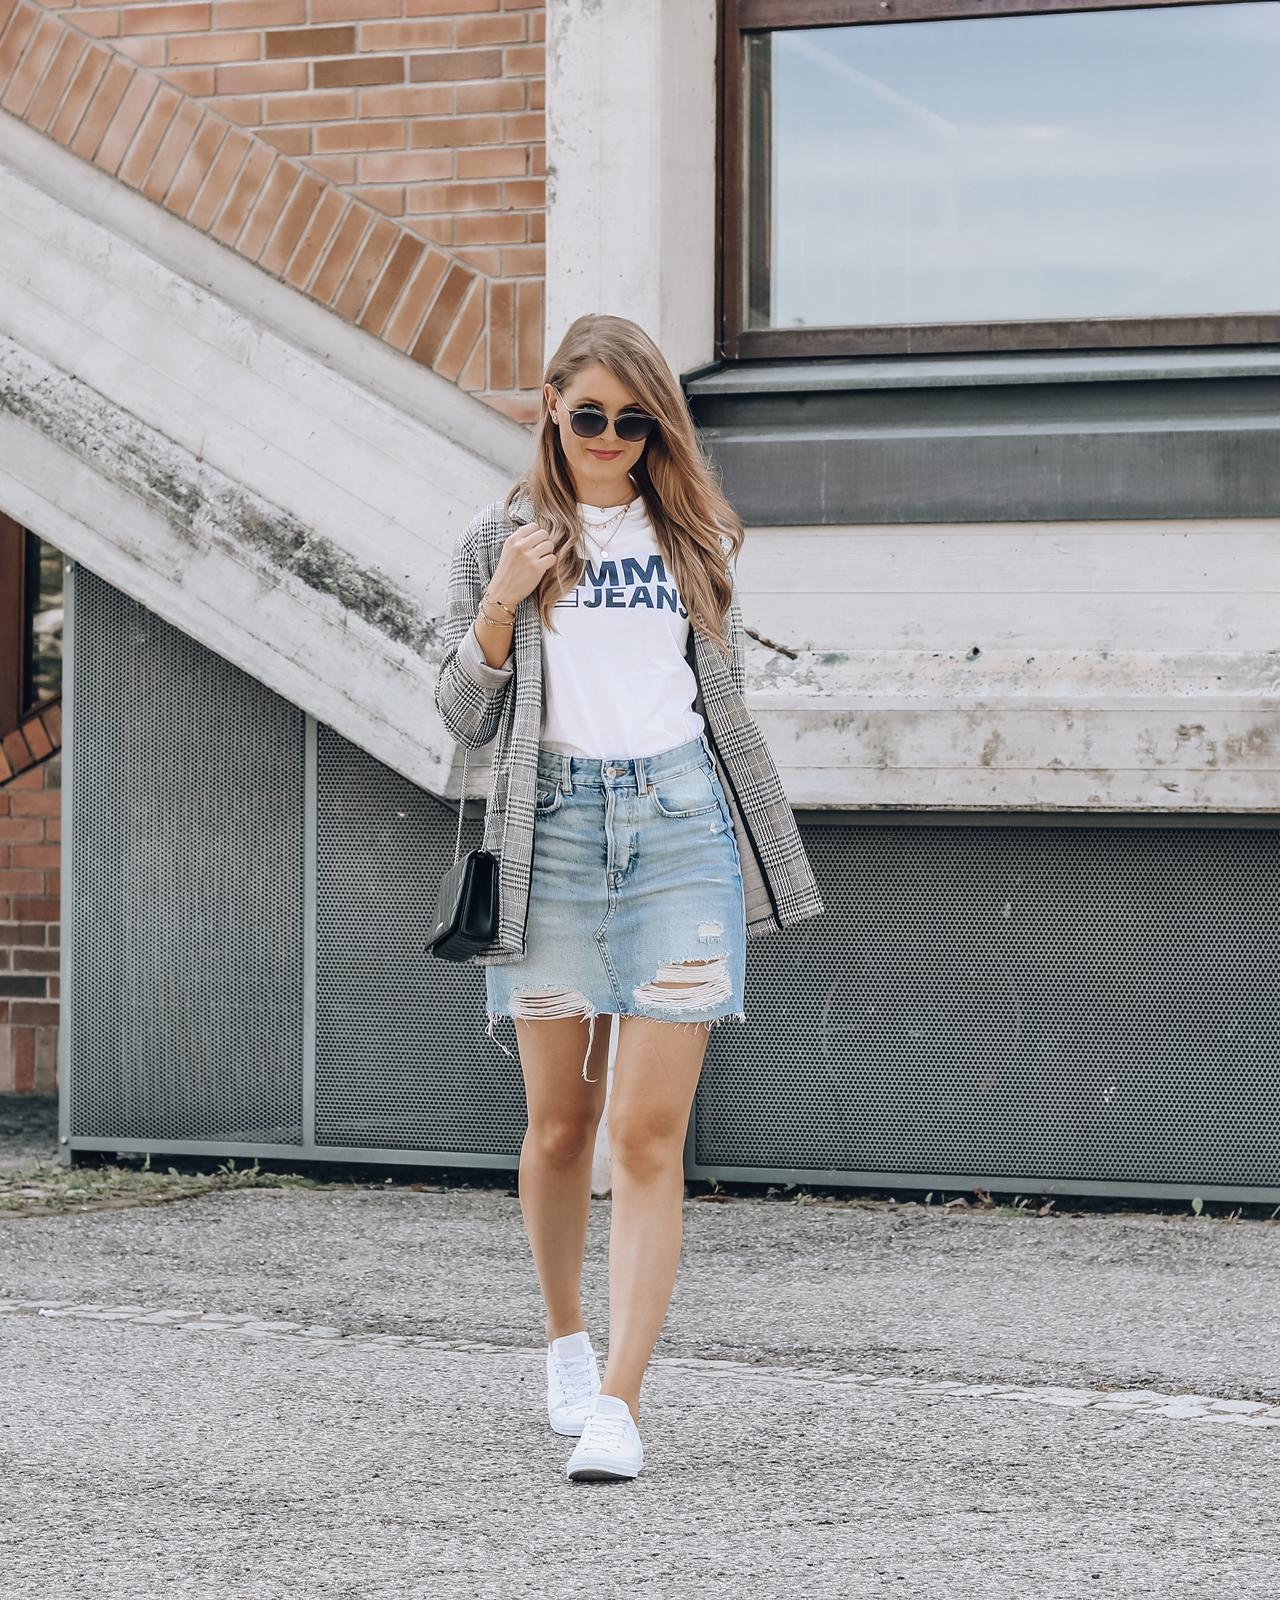 Was ziehe ich heute an 15 Outfit Ideen für Frühling und Sommer - Outfits für den Frühling - Outfits für den Sommer - Was ziehe ich an? - Was ziehe ich heute an? Outfits kombinieren - Sommerlooks - Frühlingslooks - Outfit Ideen - Fashionladyloves by Tamara Wagner - Modeblog - Fashionbloggerin